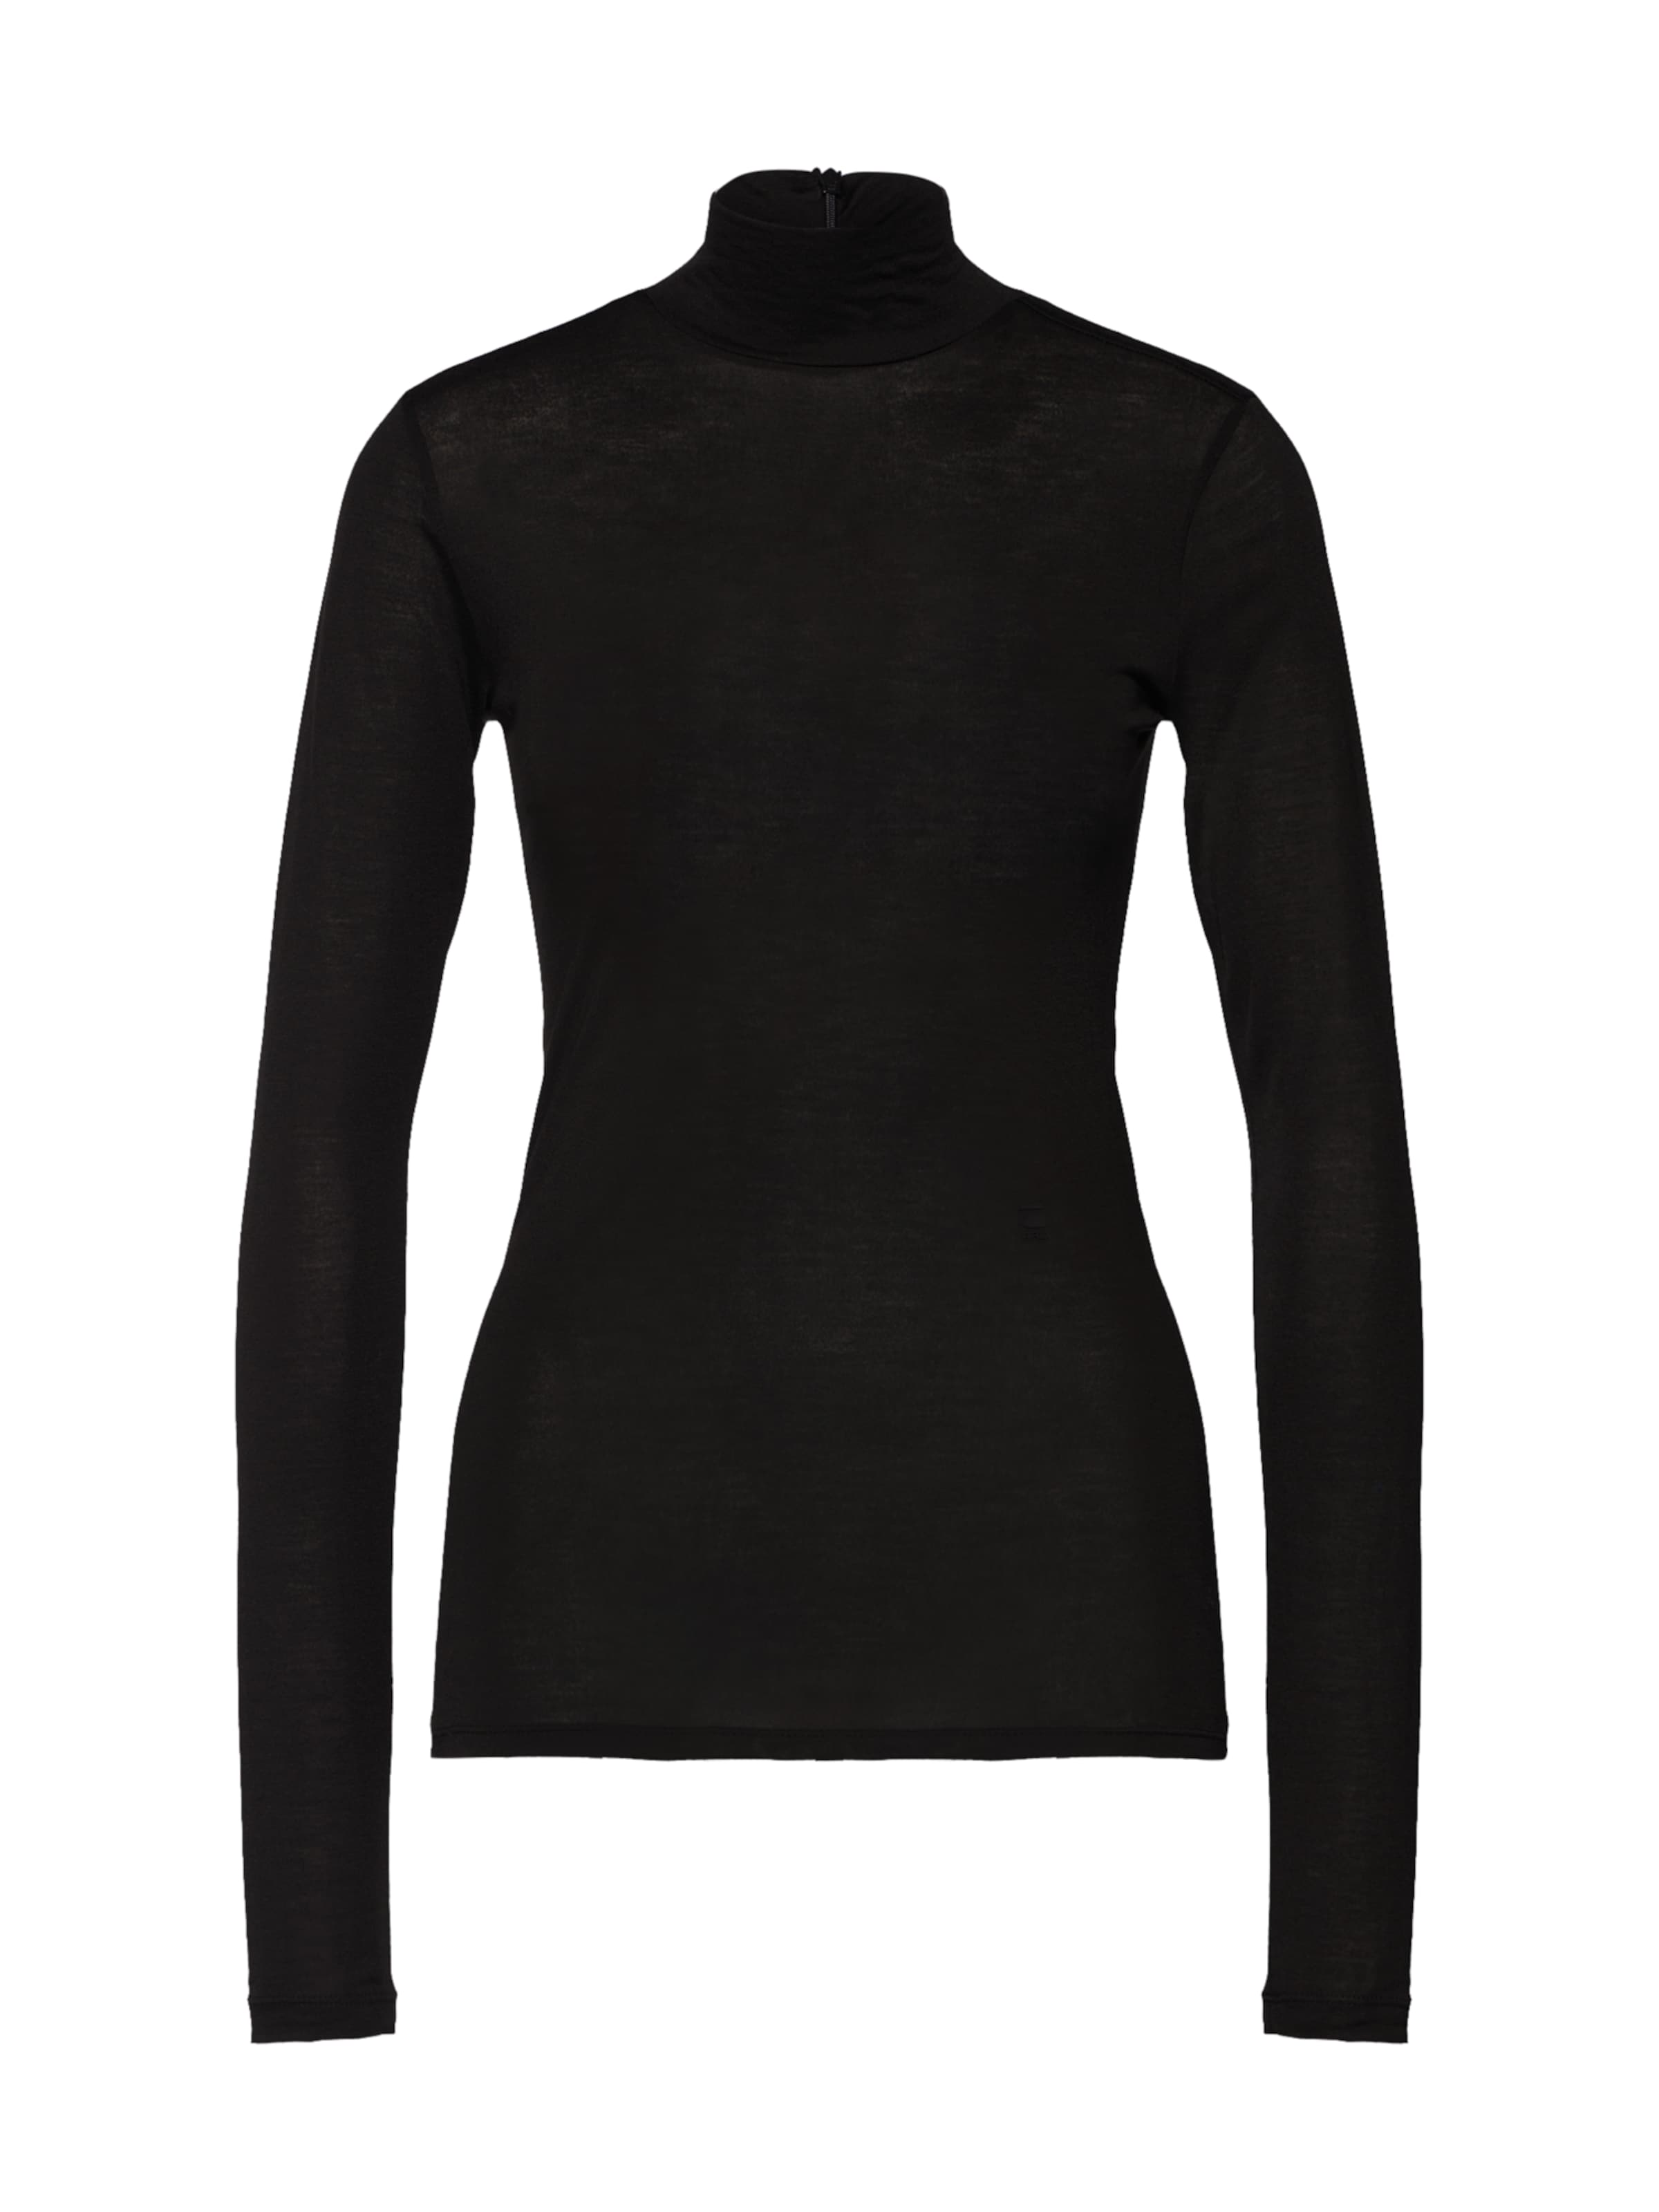 star 'hika' G T shirt Noir Raw En j34Aqc5RL